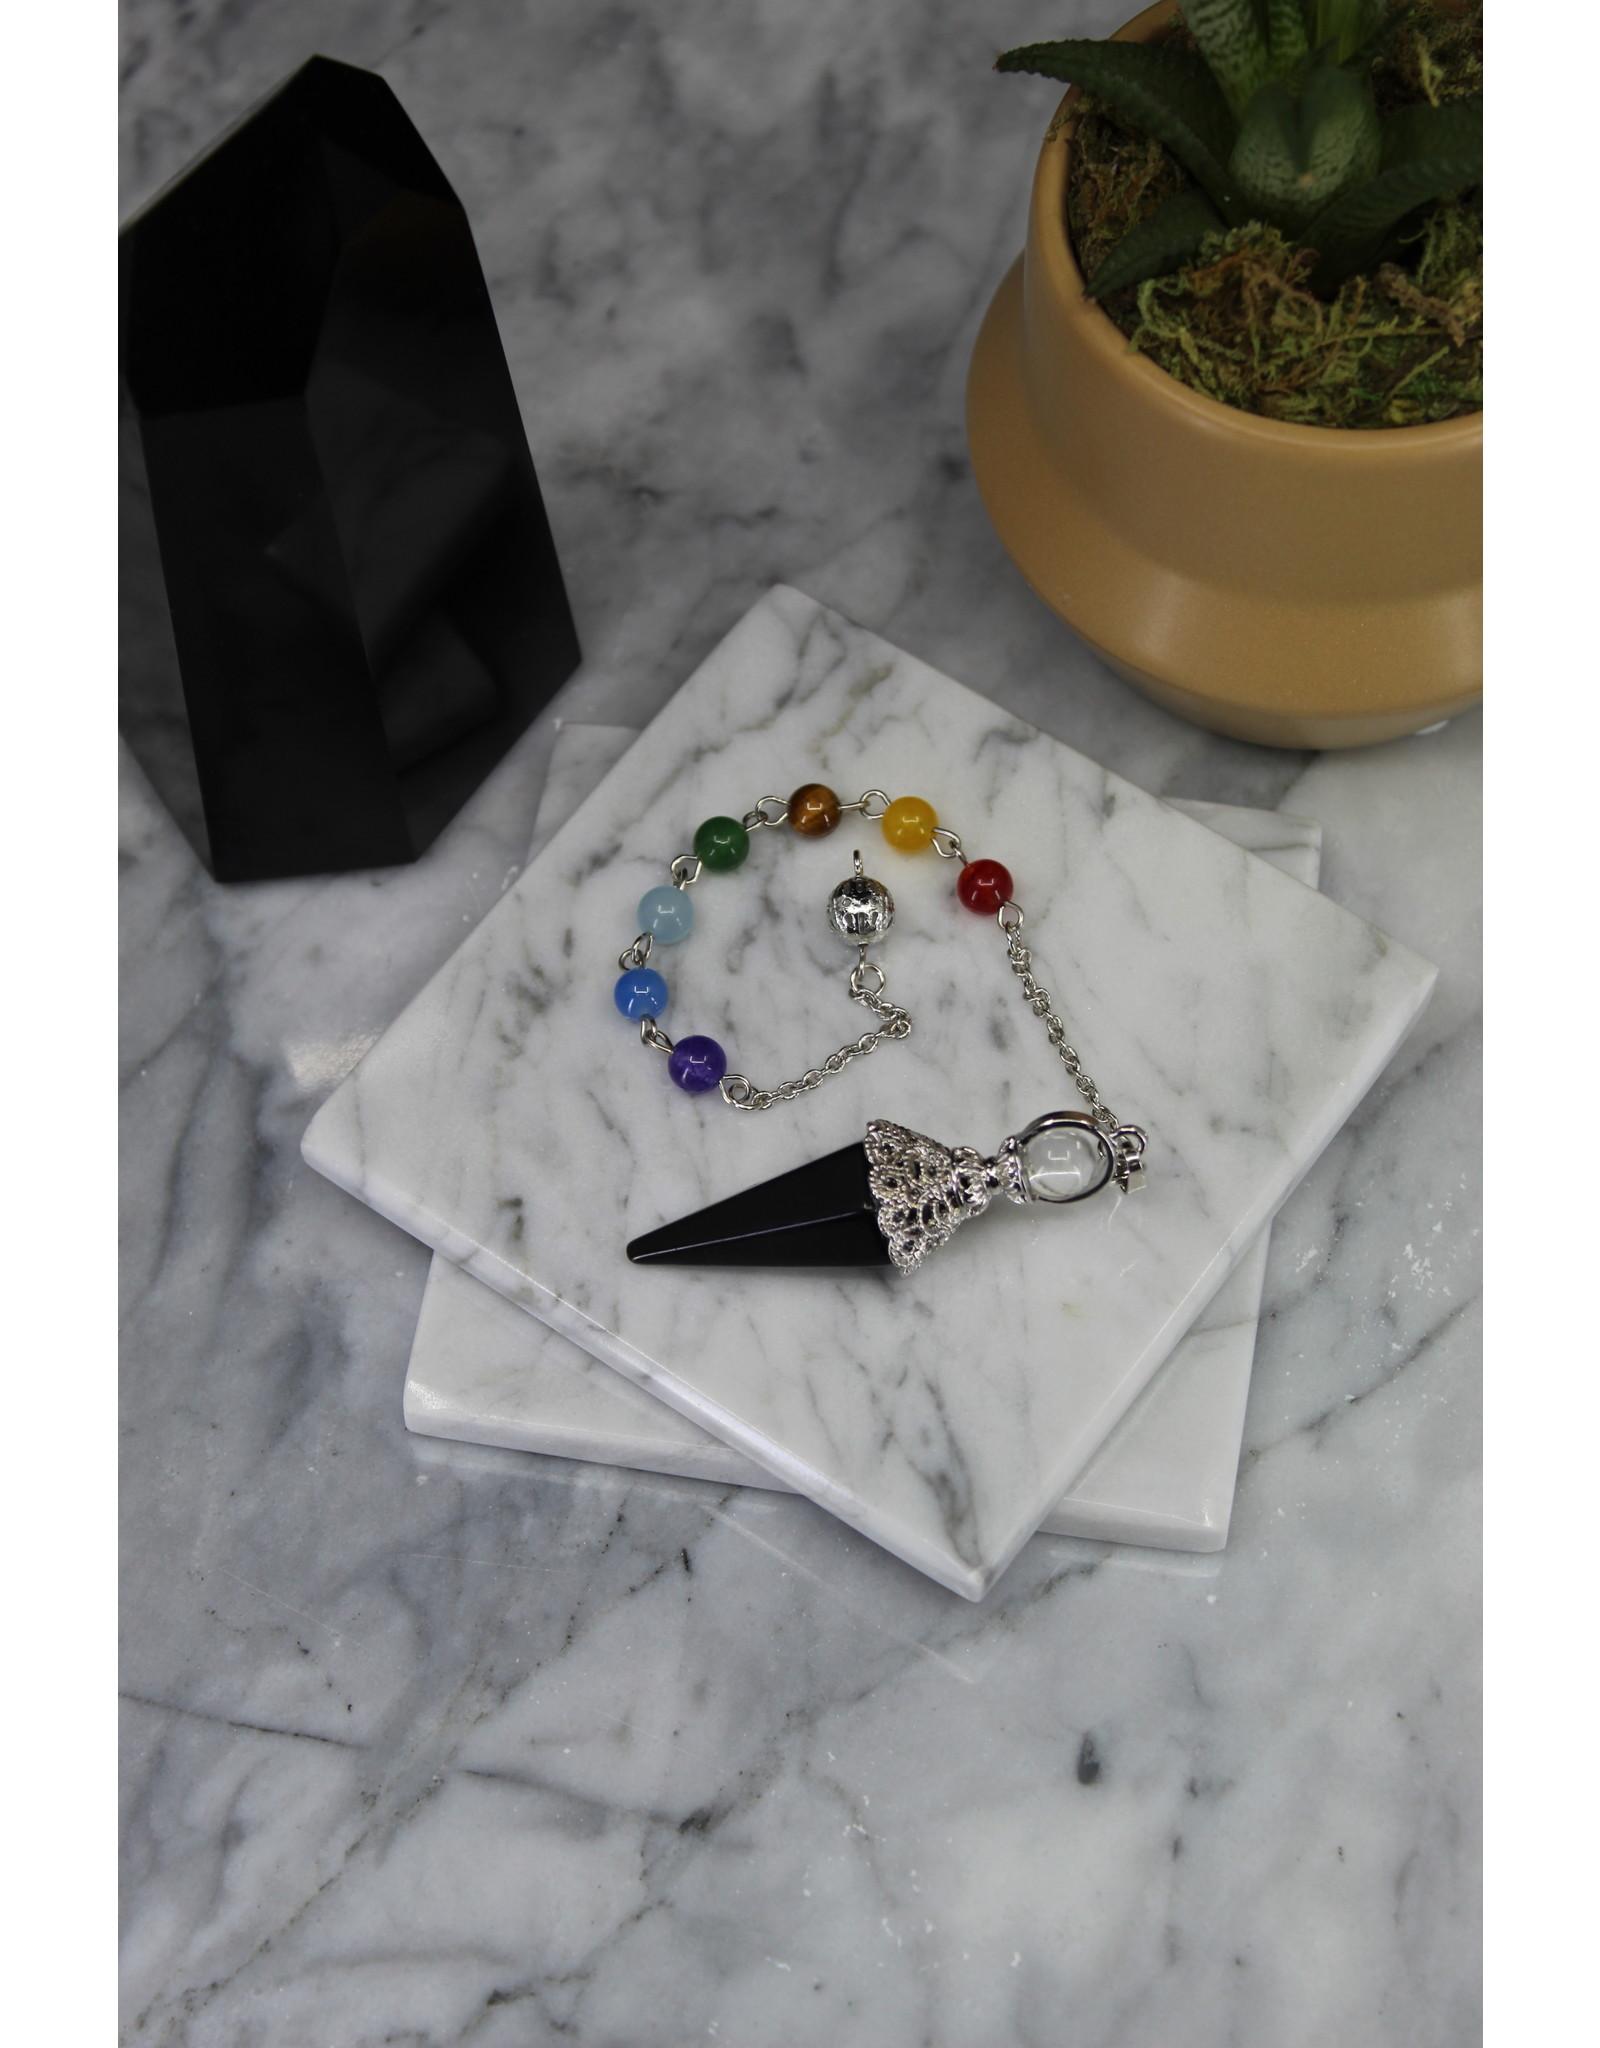 Pendulum -Black Obsidian Silver Antique Capped Chakra Beaded